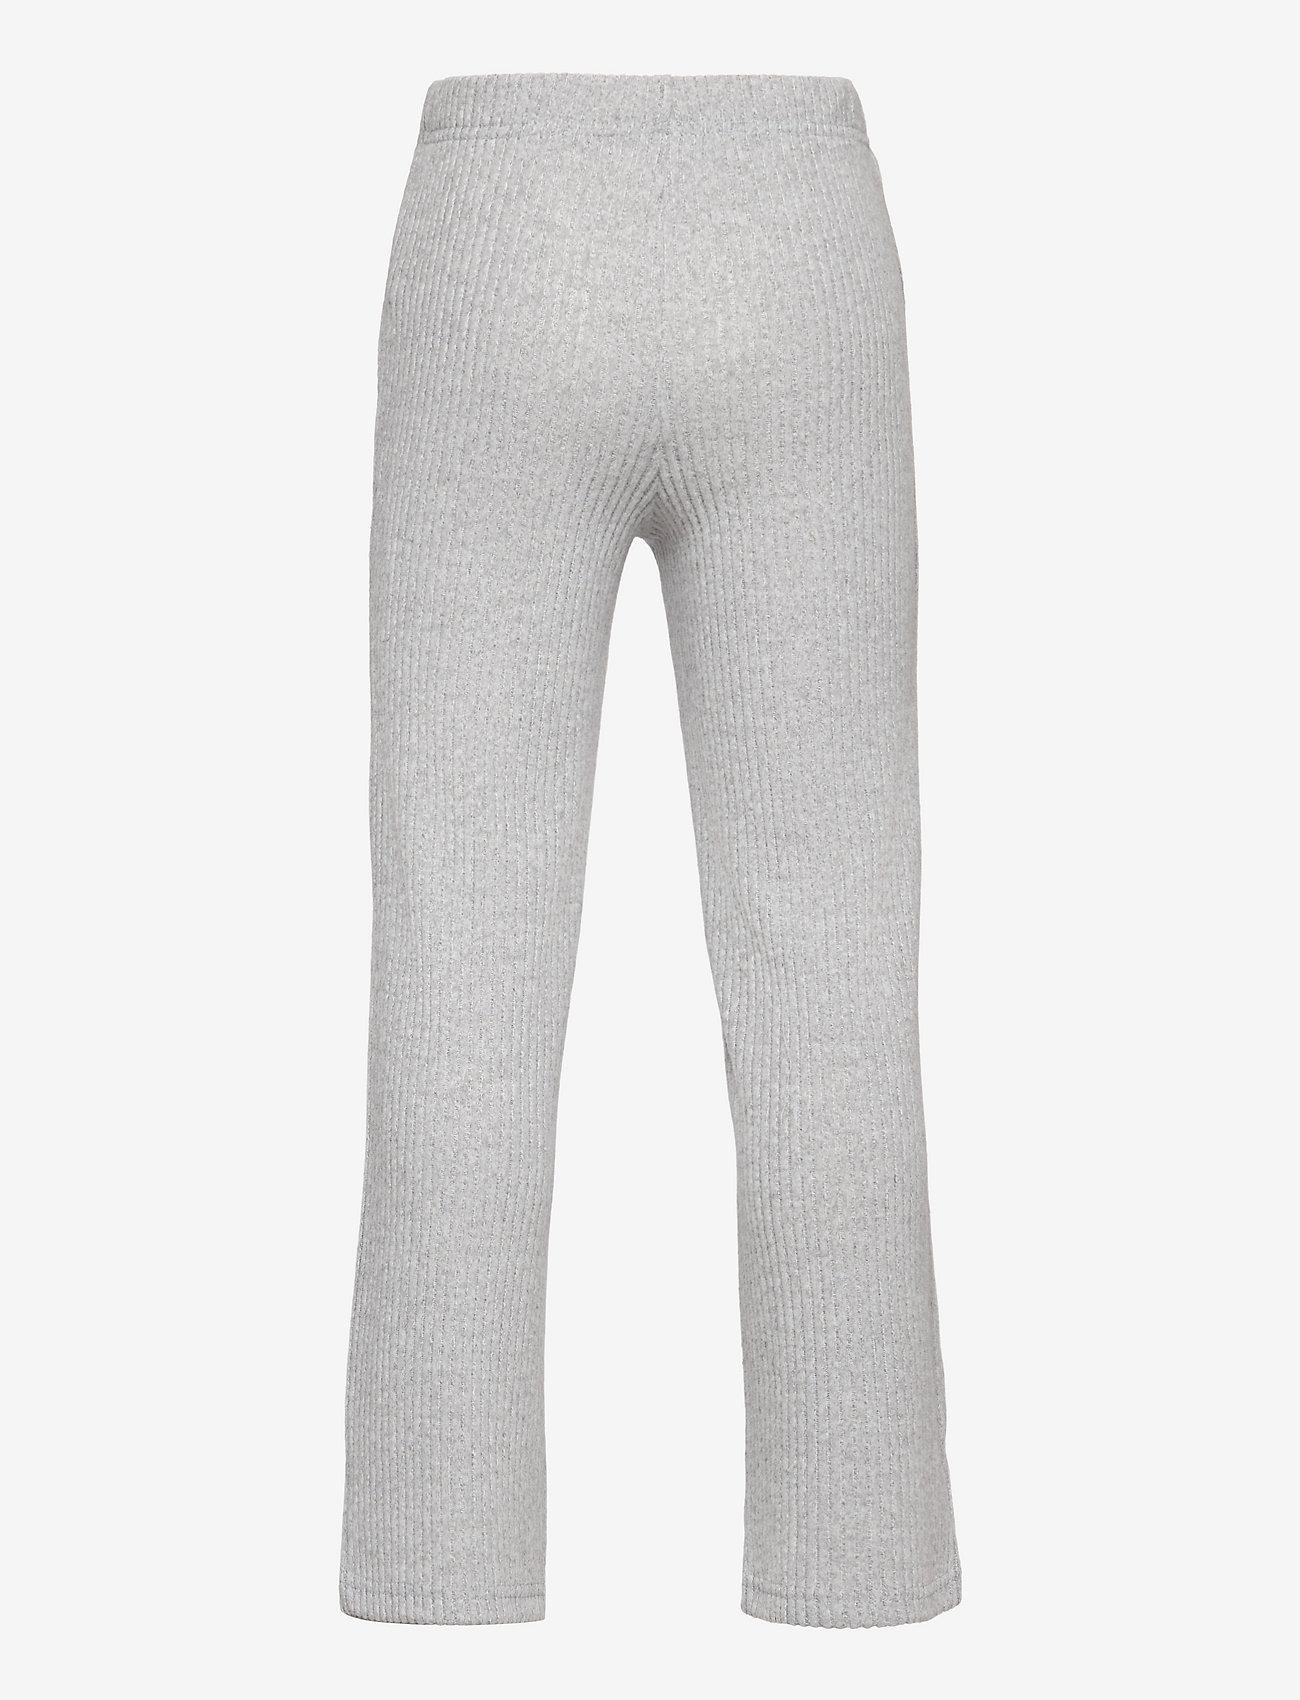 Kids Only - KONCORTNEY PANT SWT - hosen - light grey melange - 1